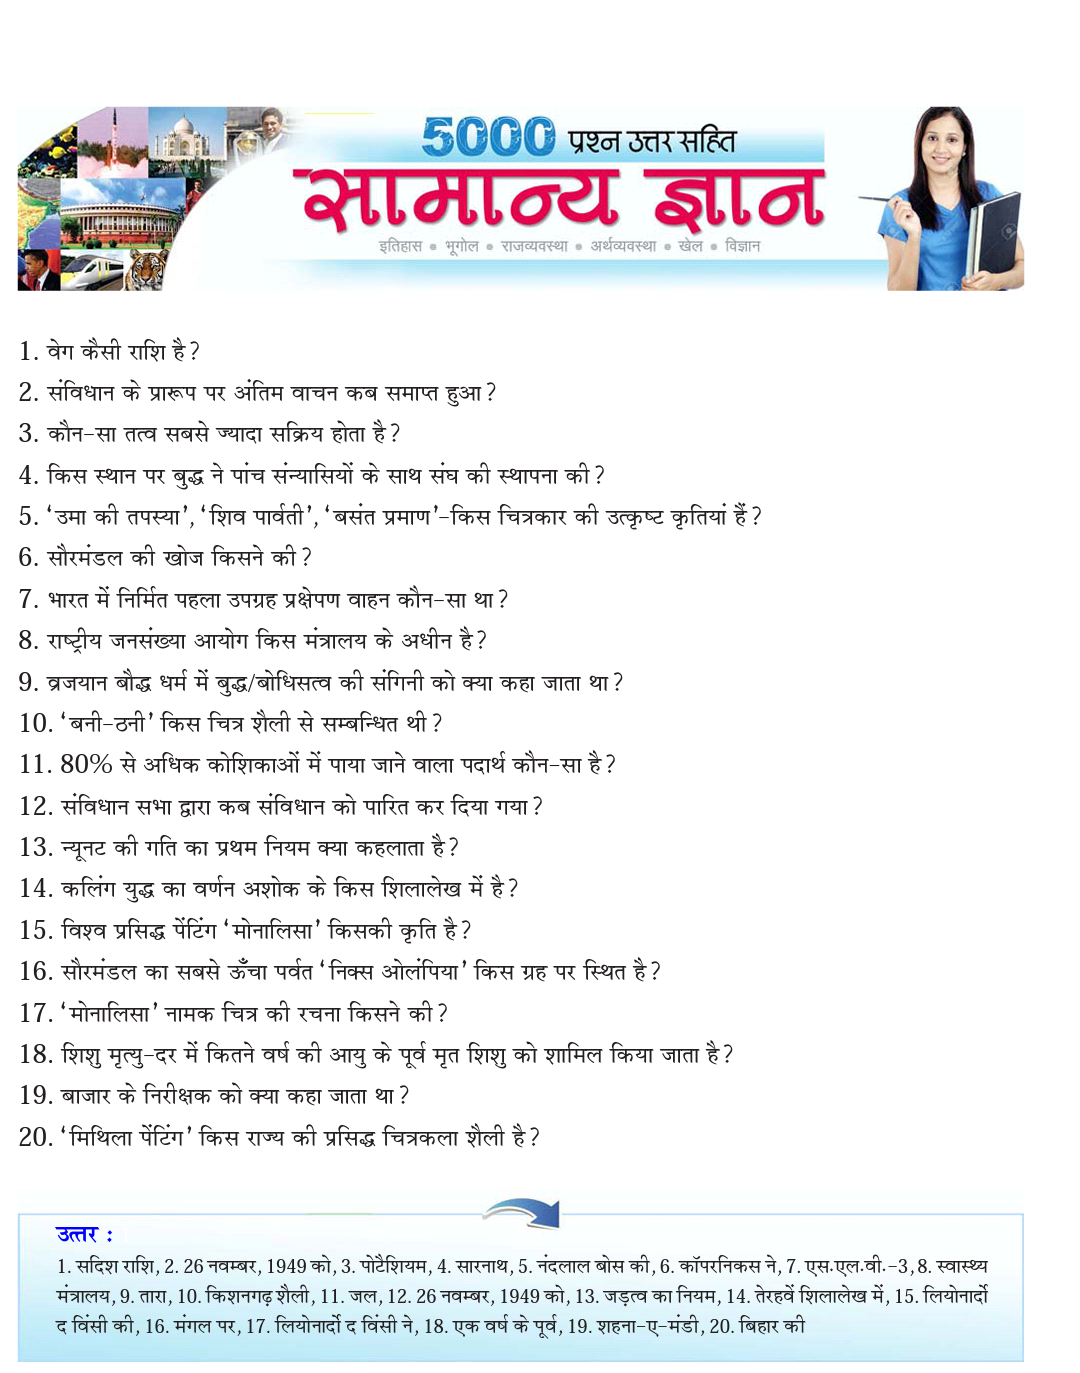 Railway locopilot GK TOP 5000 MOST IMPORTANT QUESTIONS